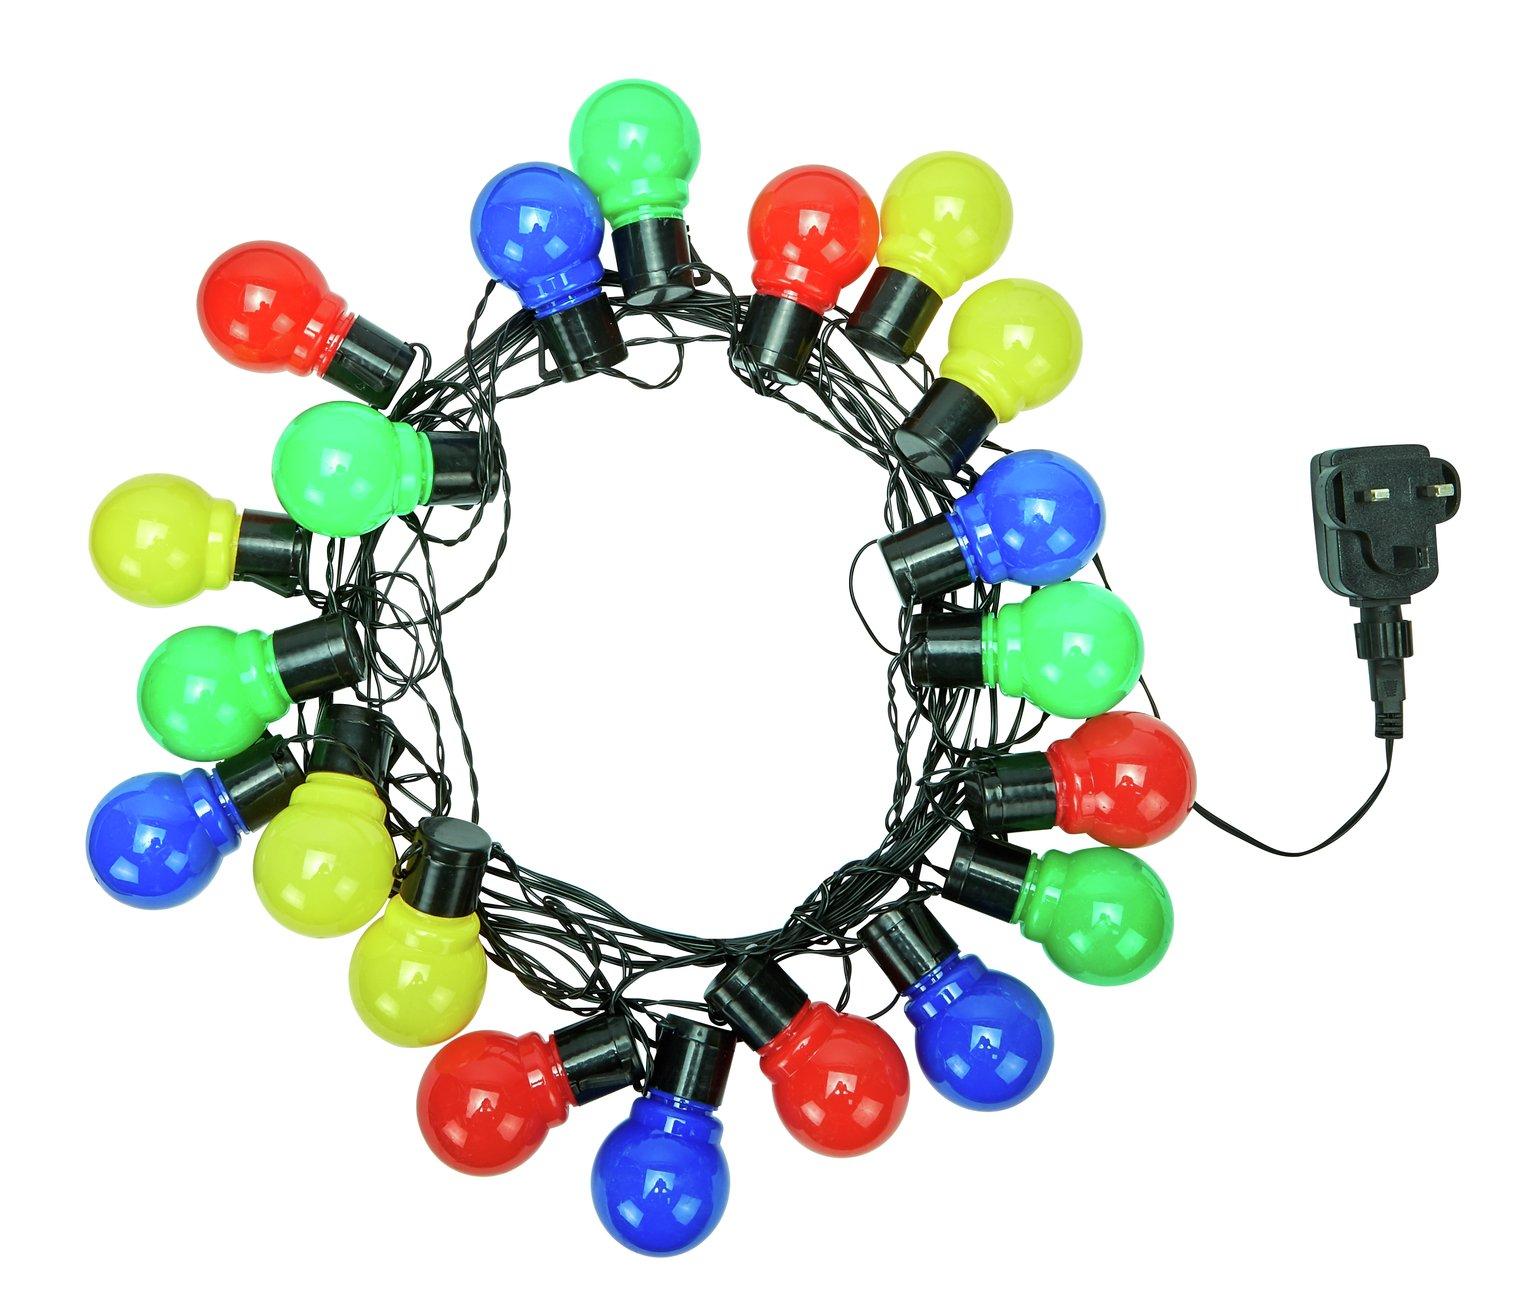 Outdoor Solar Lights Wilko: Wilko Emerald Jewel Christmas LED Lights Multi Coloured X